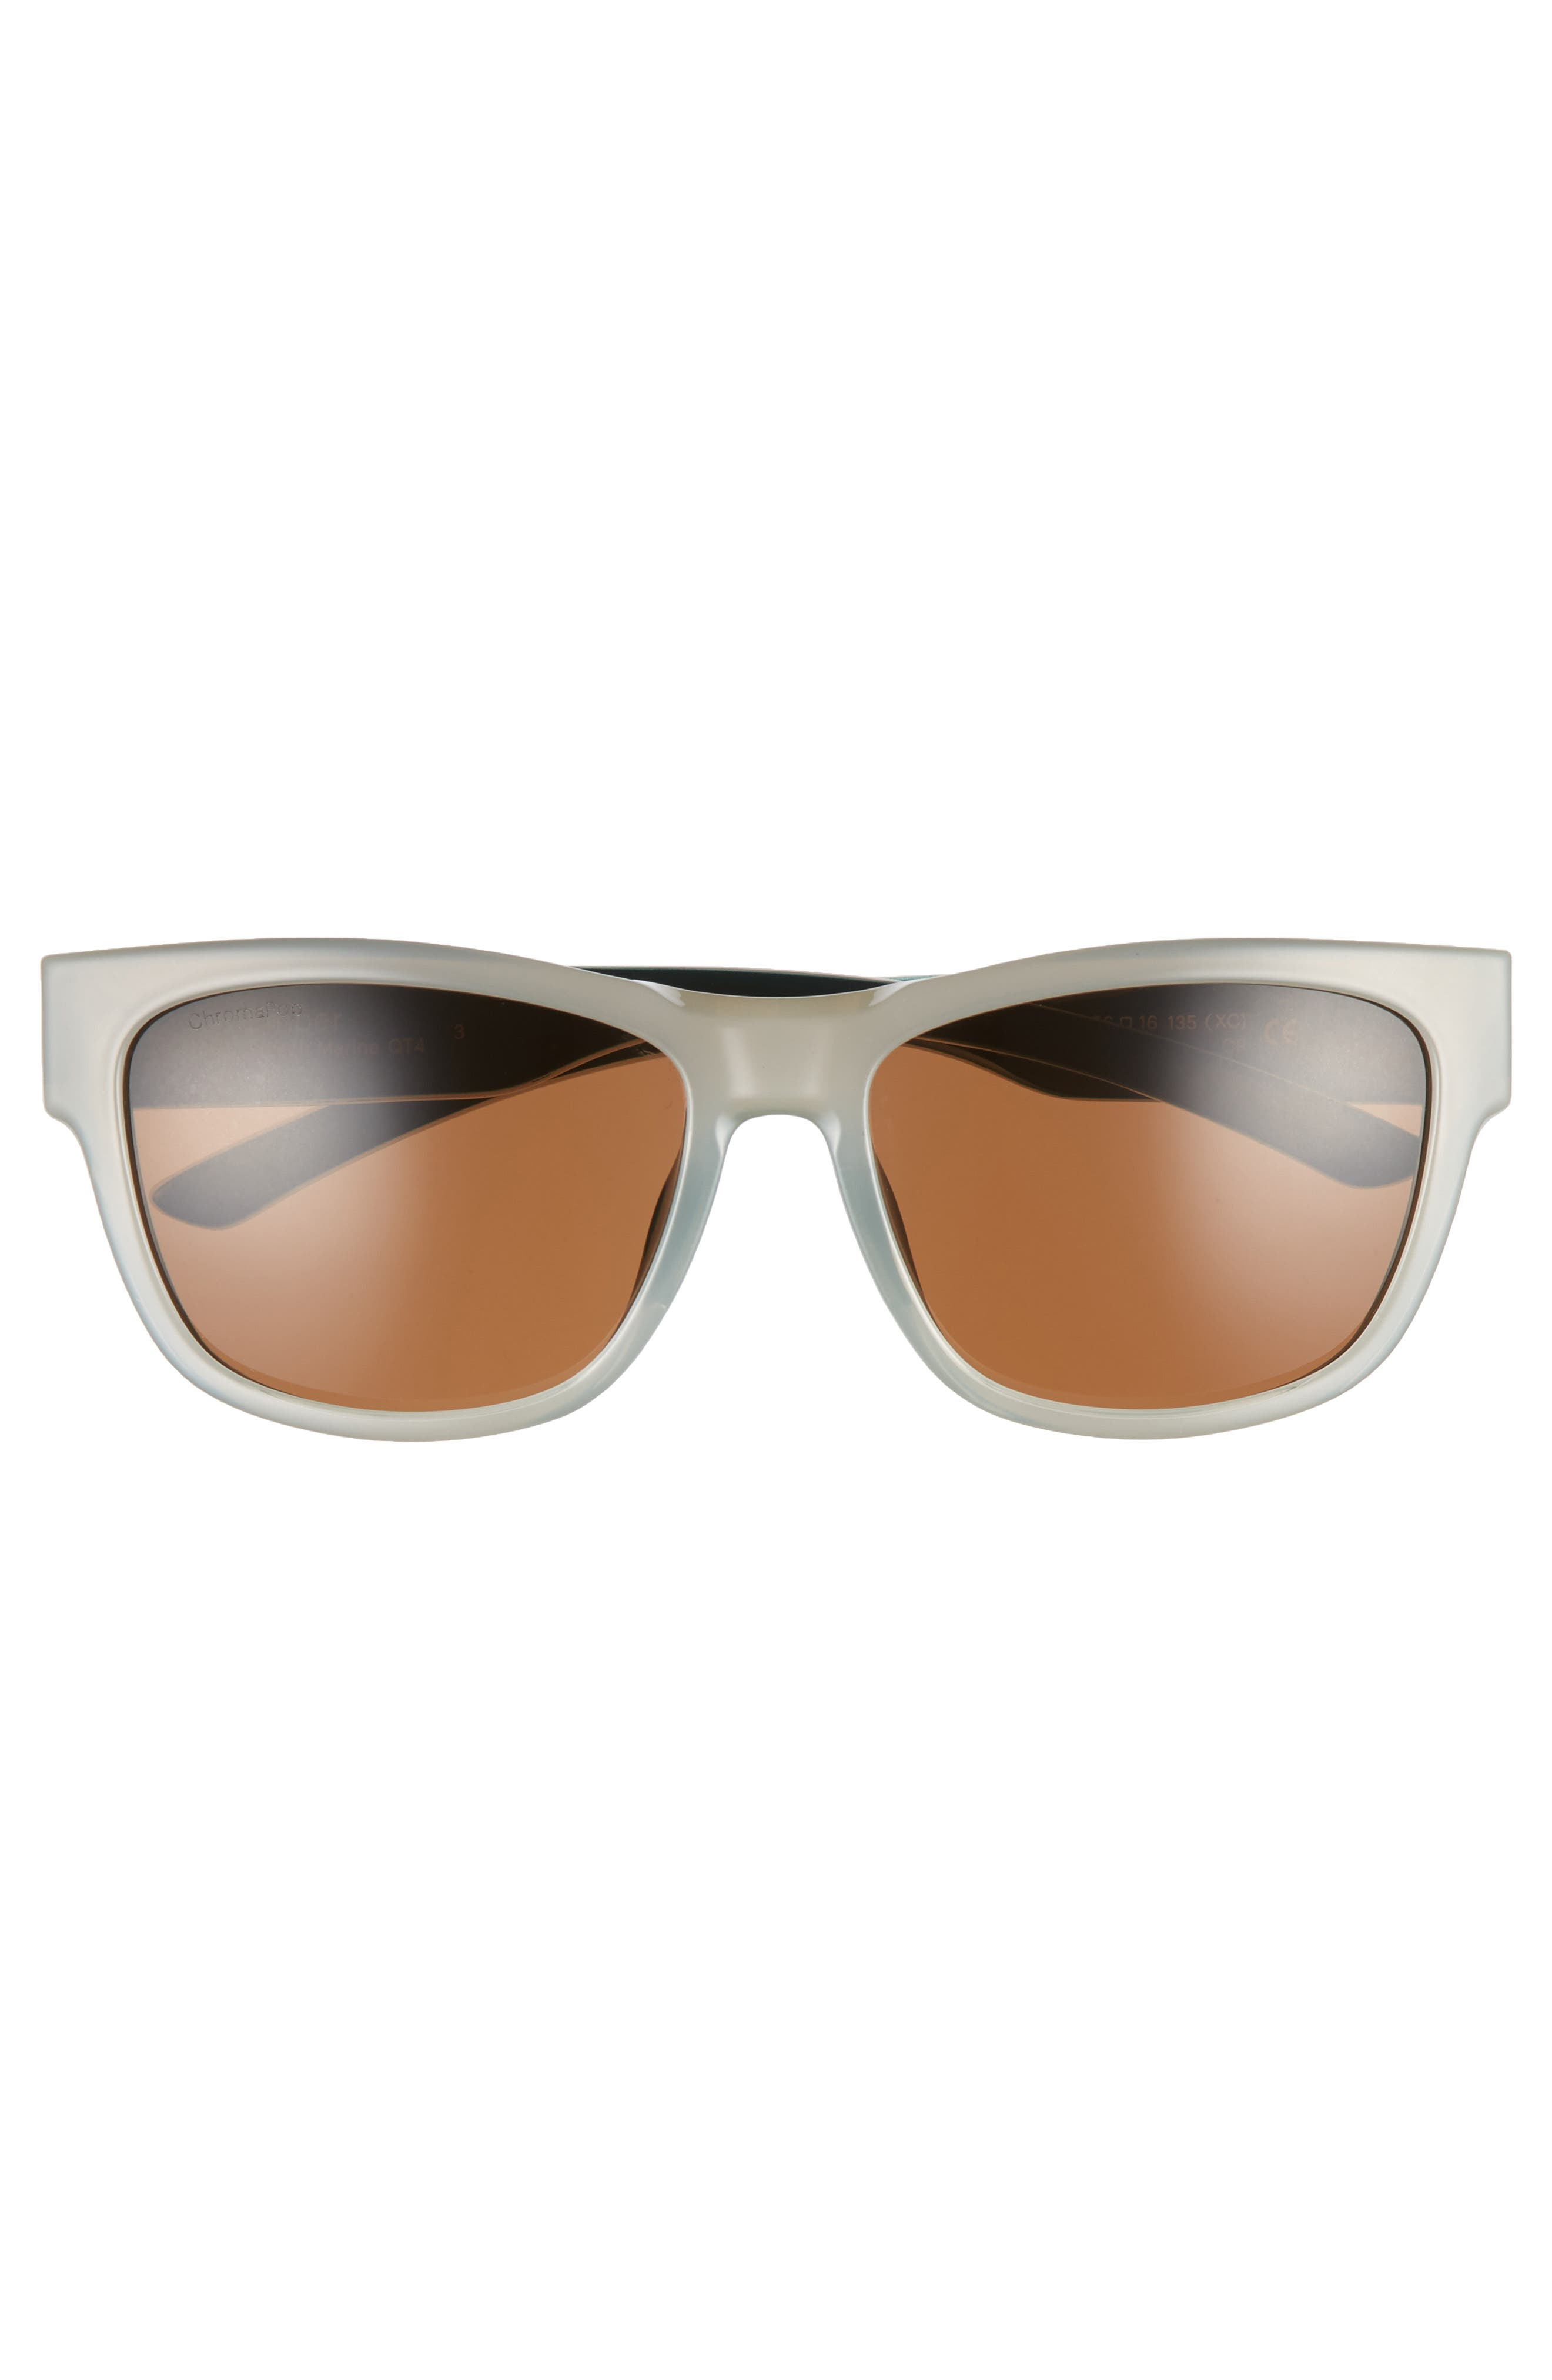 Ember 52mm ChromaPop<sup>™</sup> Sunglasses,                             Alternate thumbnail 3, color,                             Bleach Marine